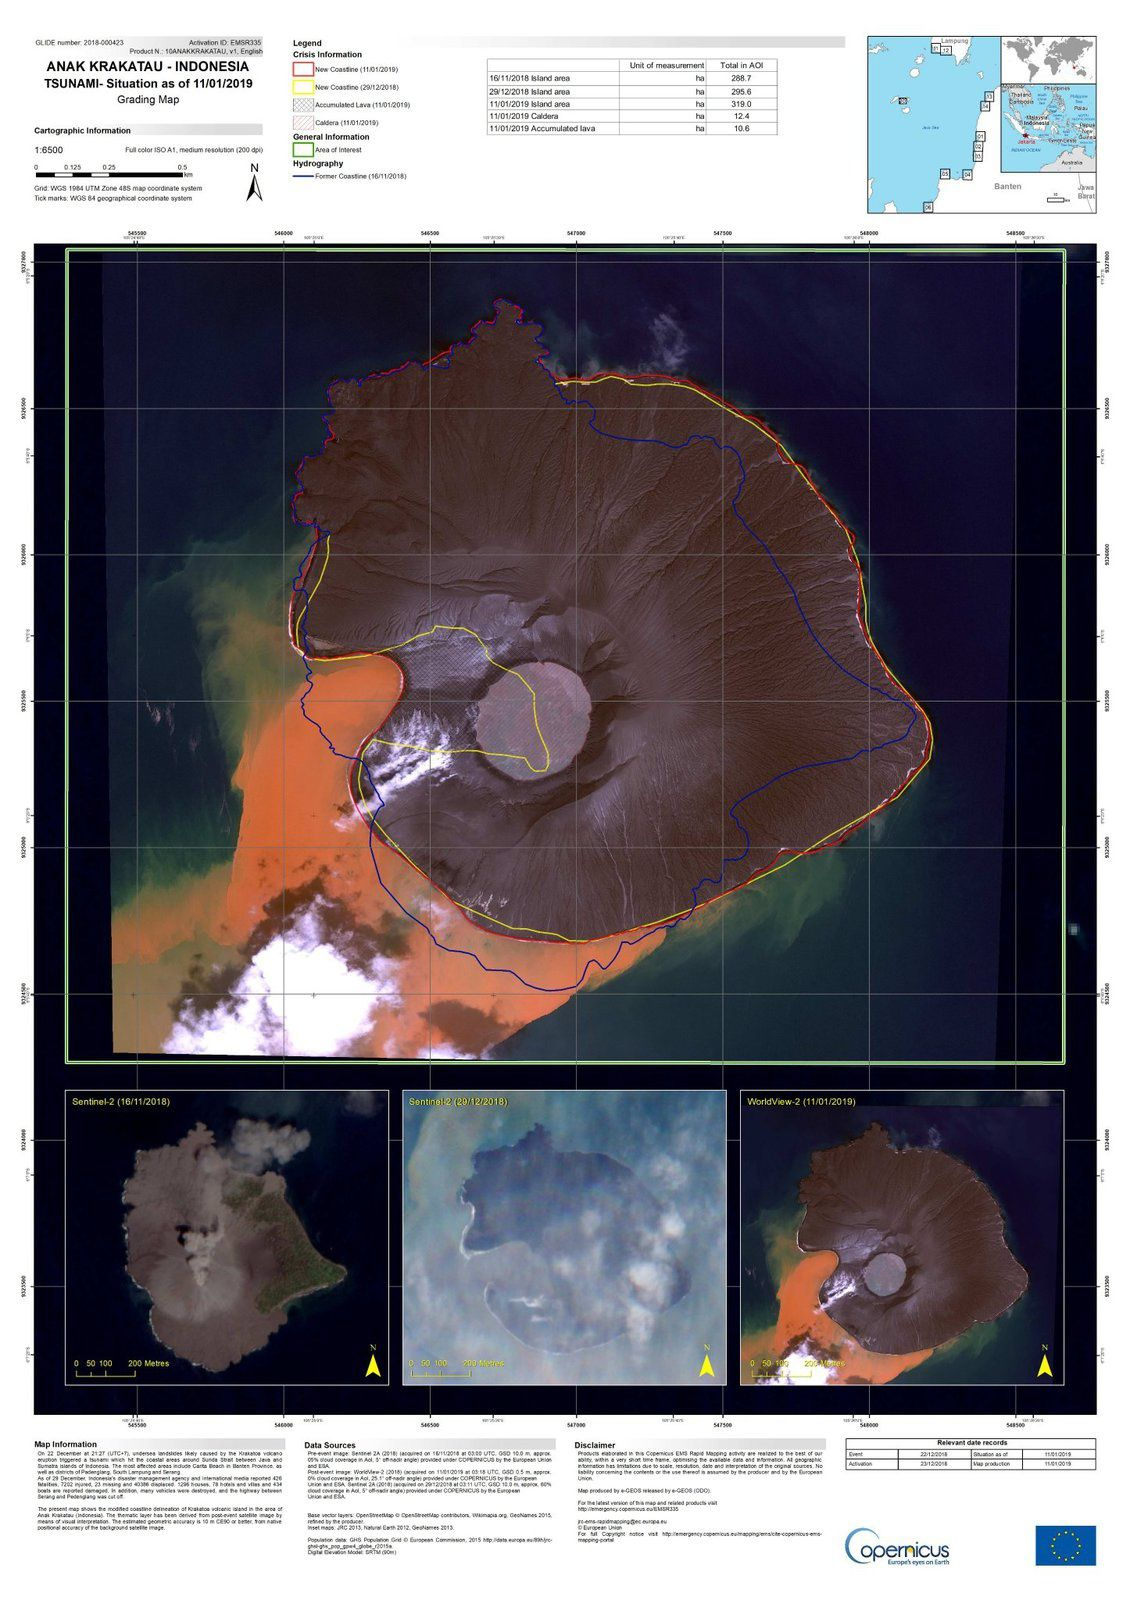 Anak Krakatau - morphological evolution between December / before the tsunami and the collapse and 11.01.2019 - Doc. Copernicus EU